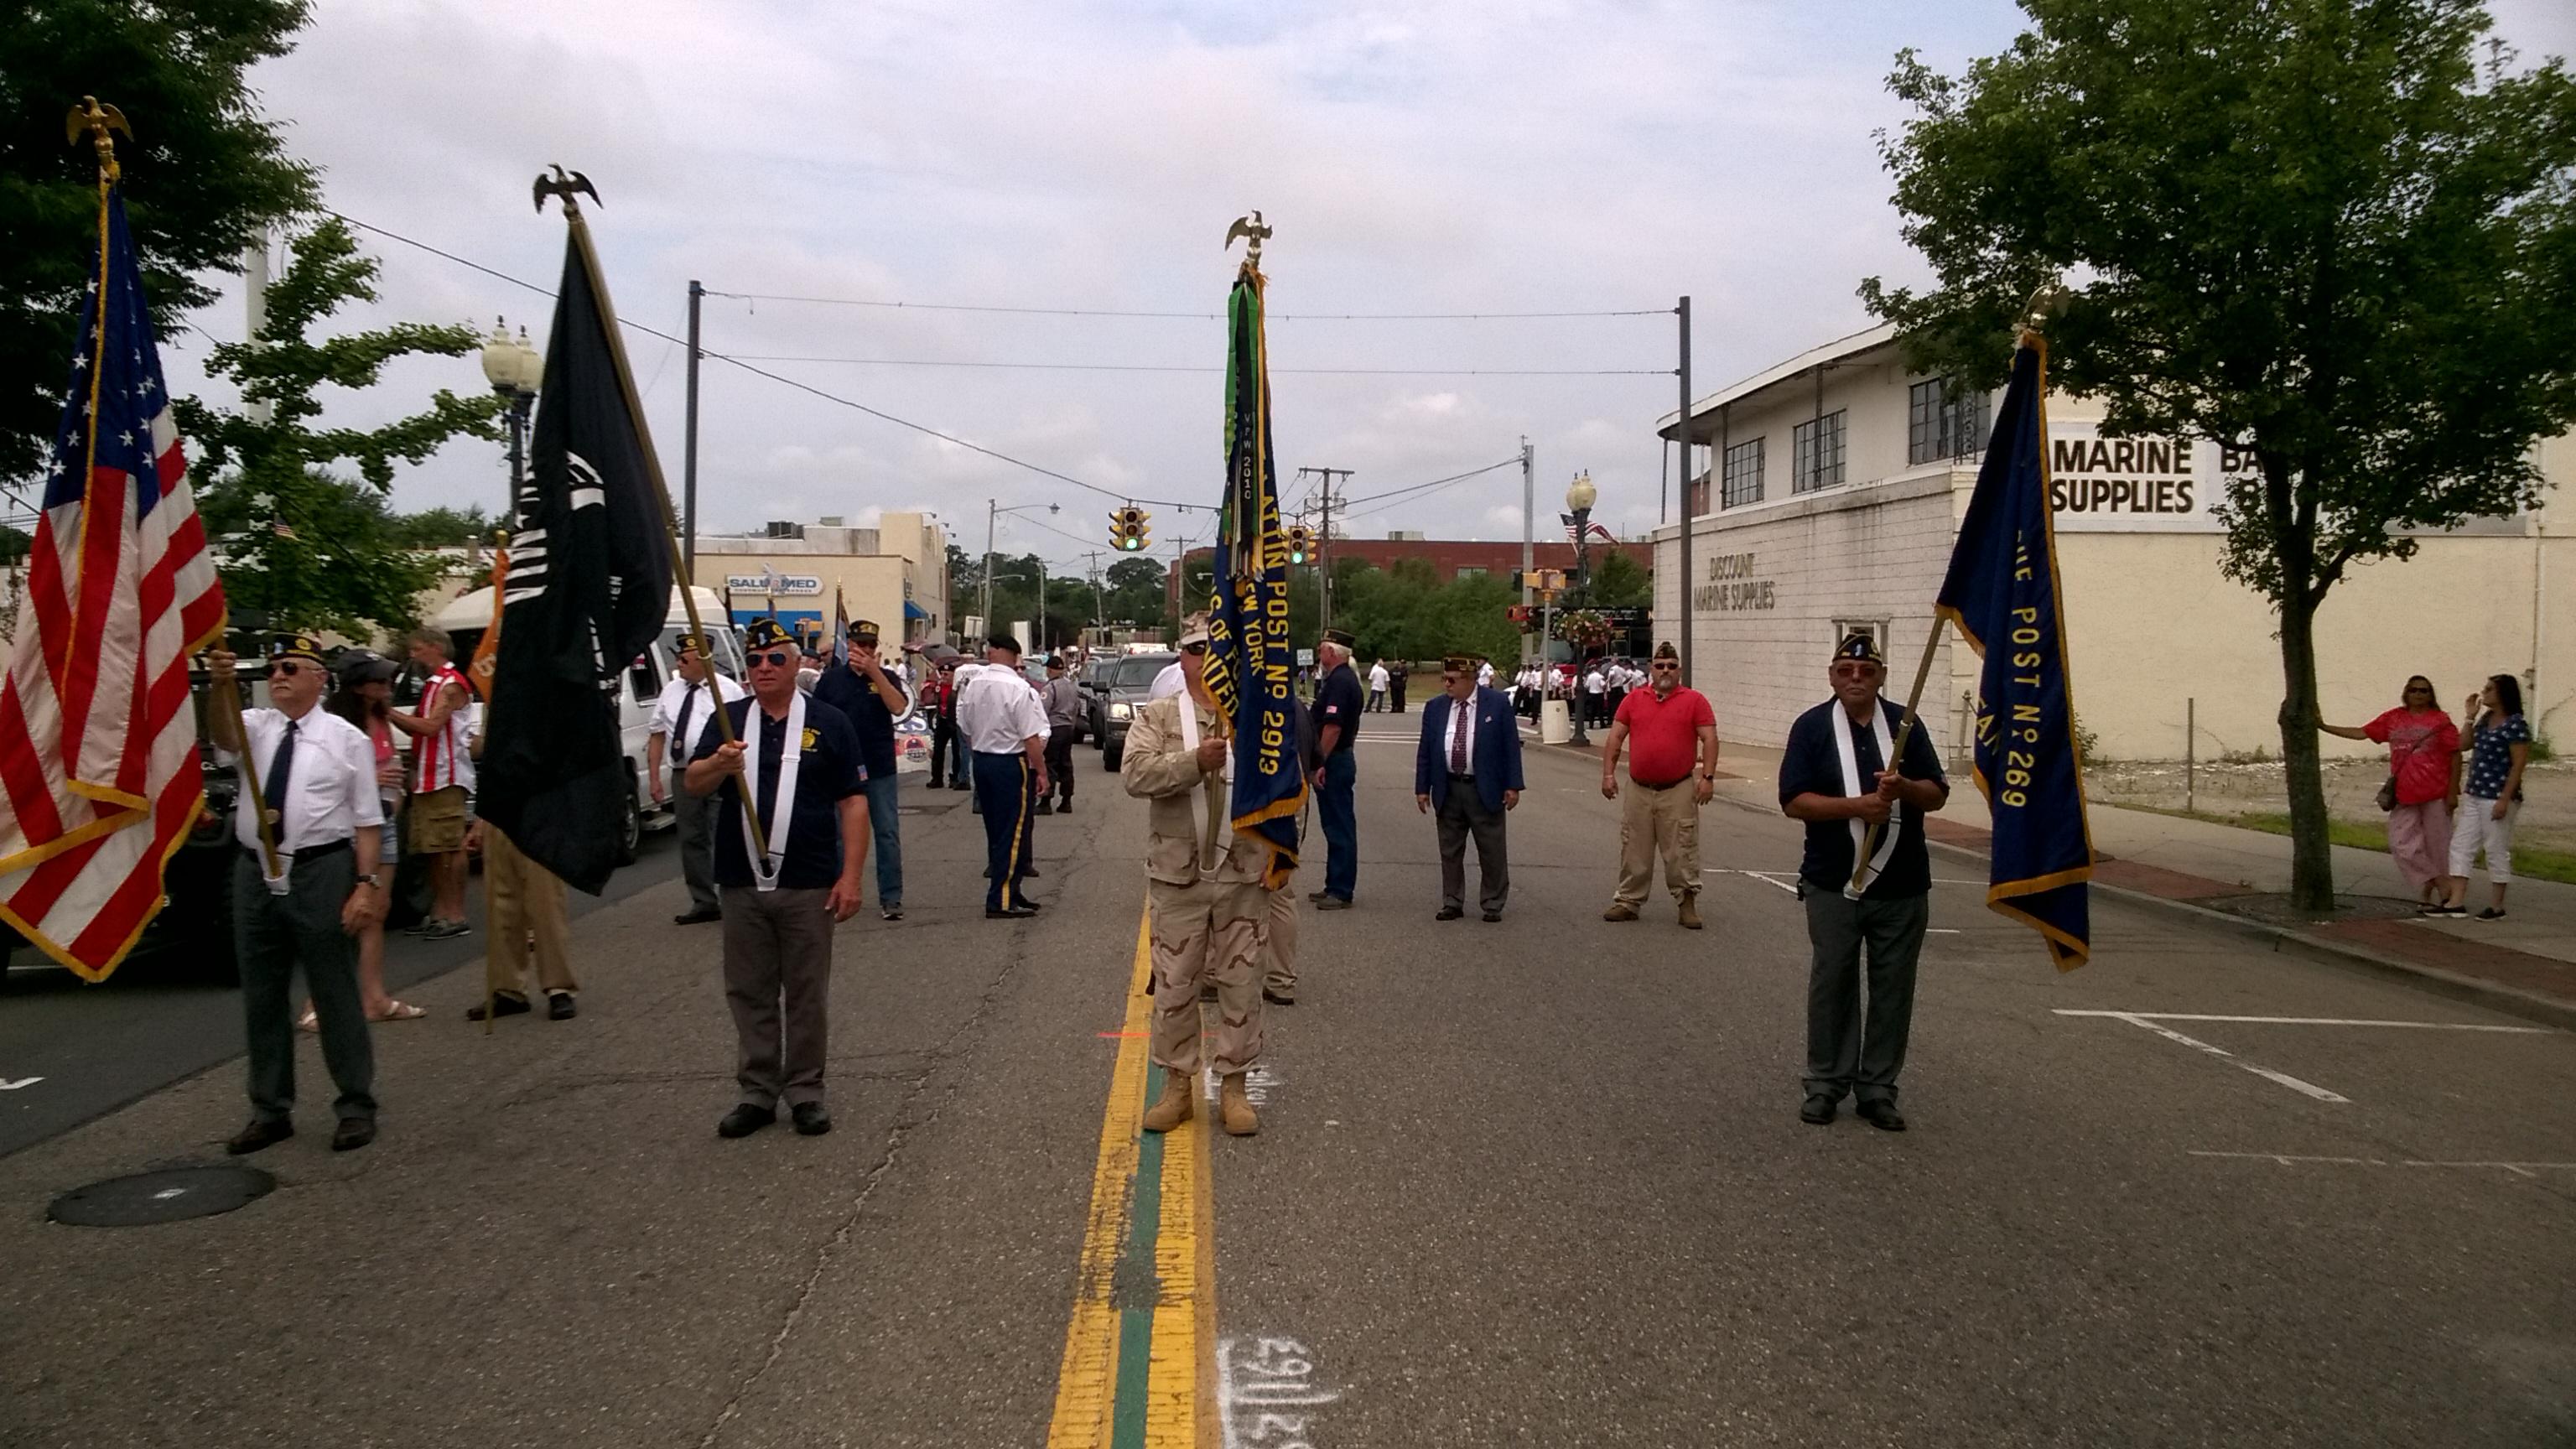 2018 - July 4th Parade